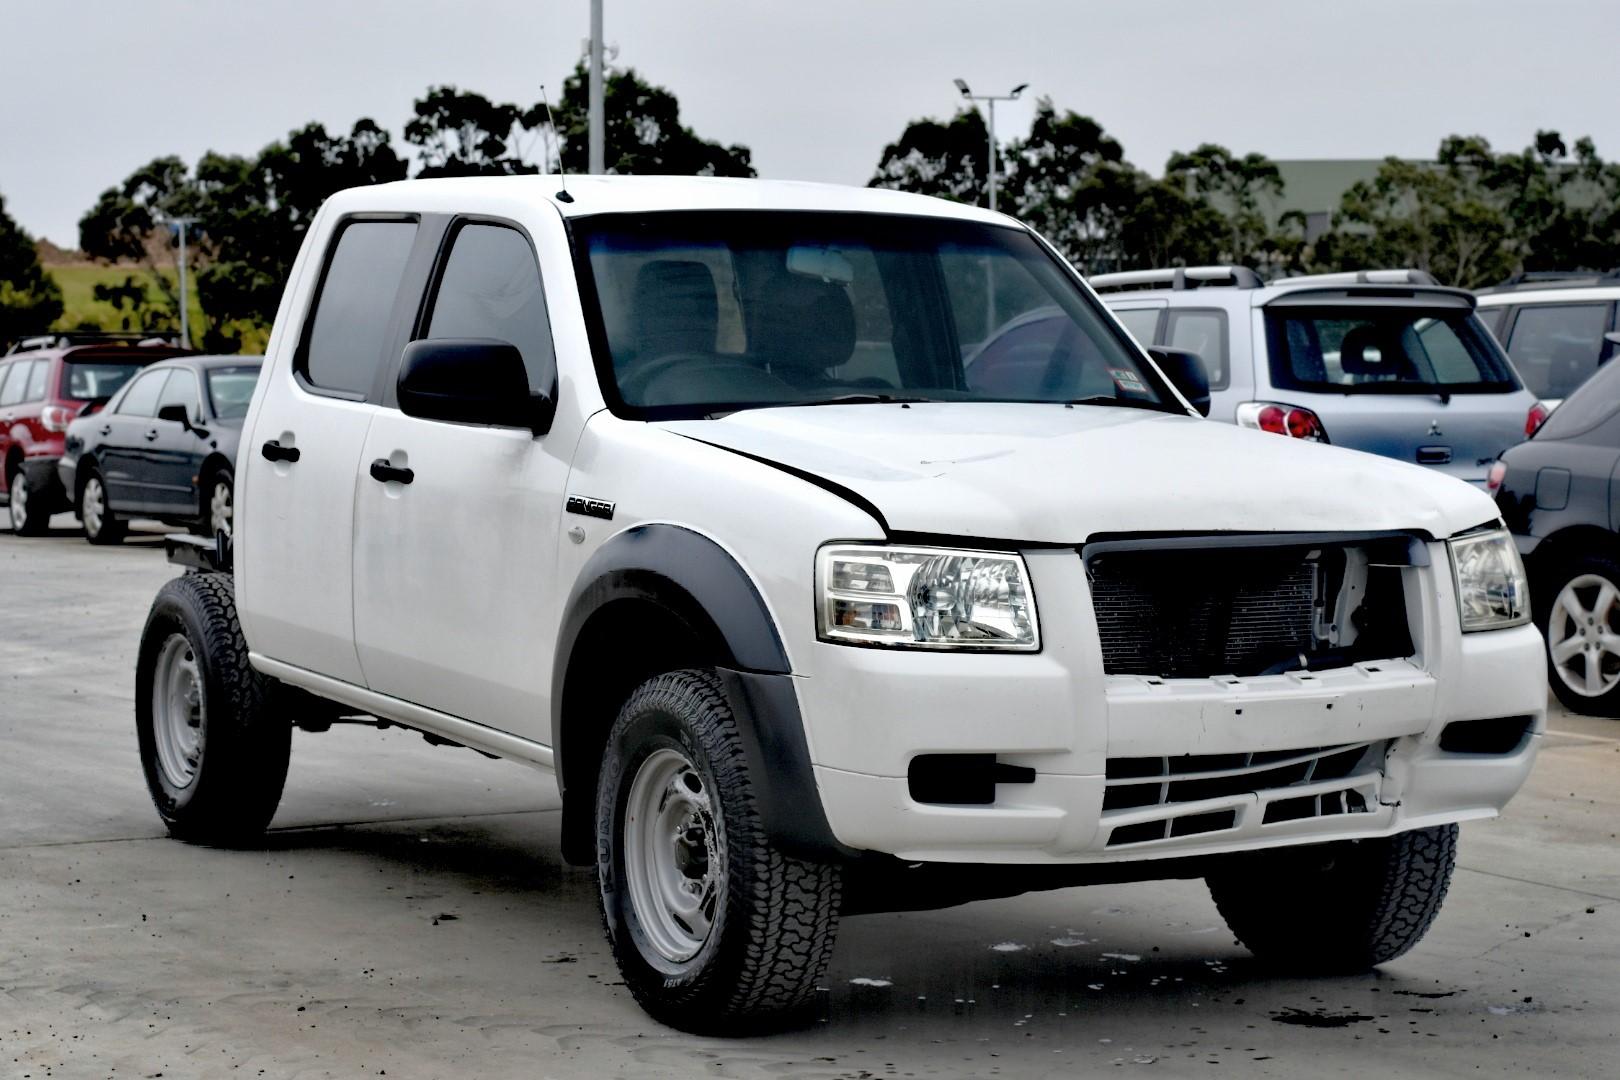 2008 Ford Ranger XL 4x2 Crew Cab PJ Turbo Diesel Auto Dual Cab (SALVAGE)